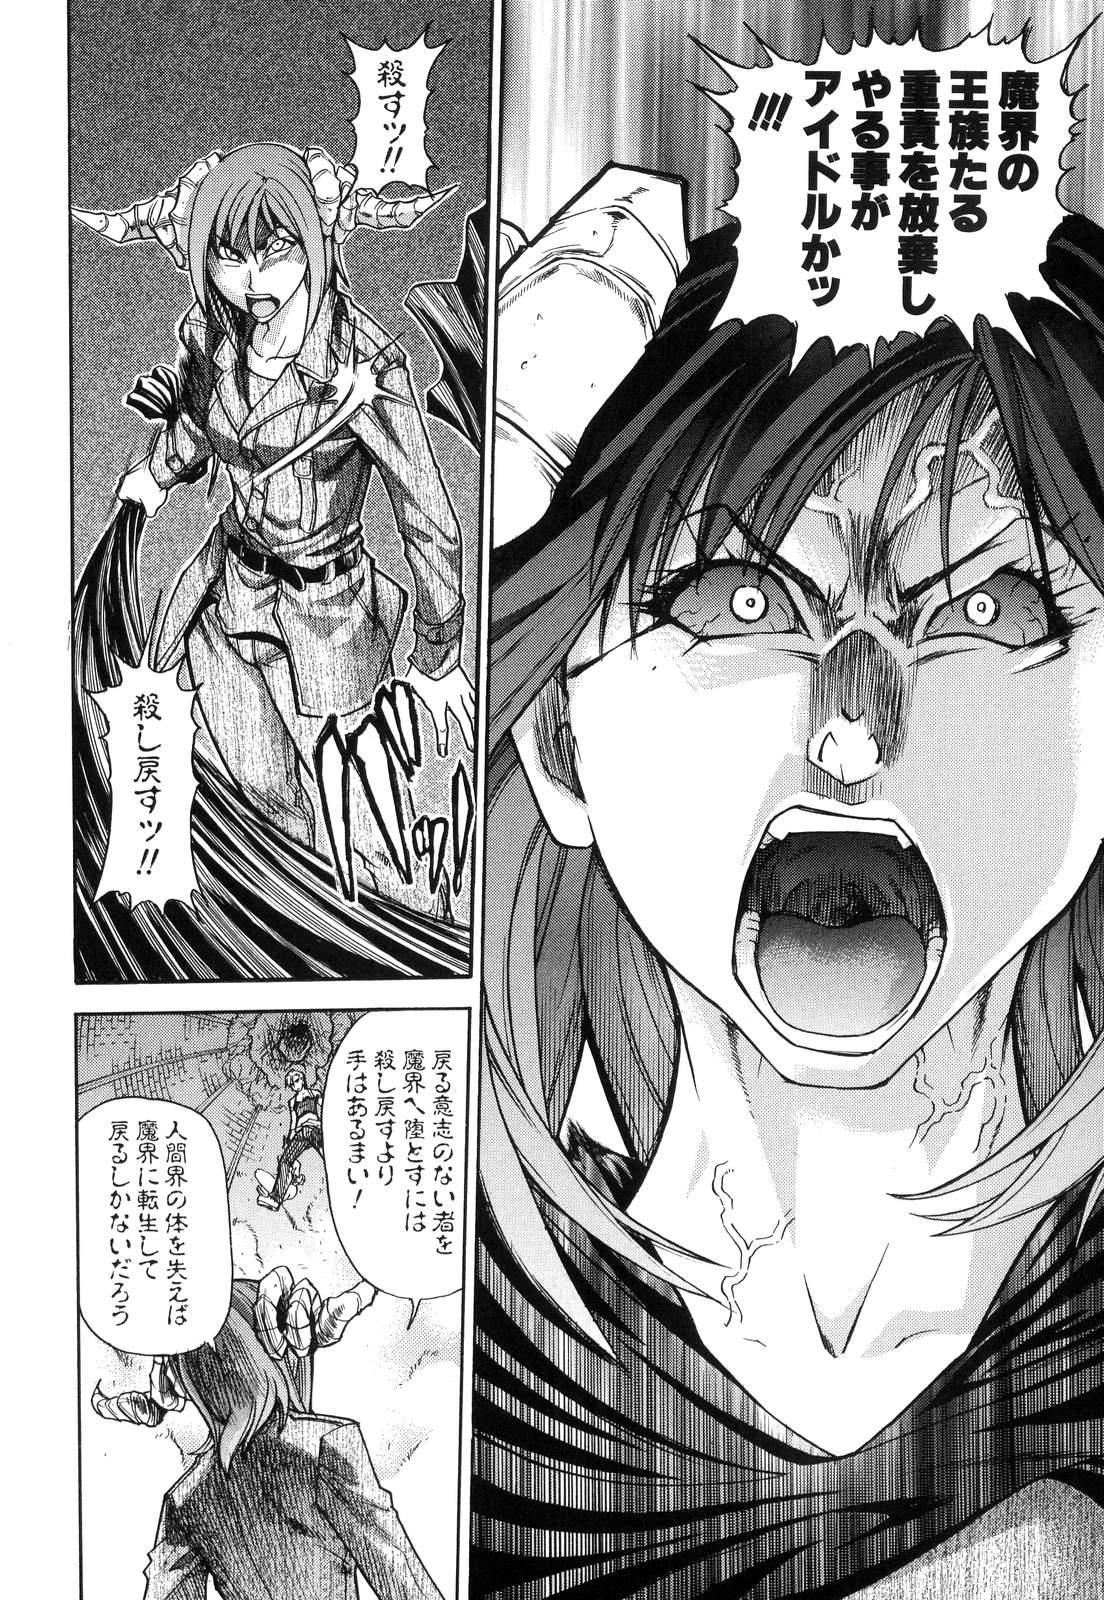 Shining Musume. 6. Rainbow Six 109